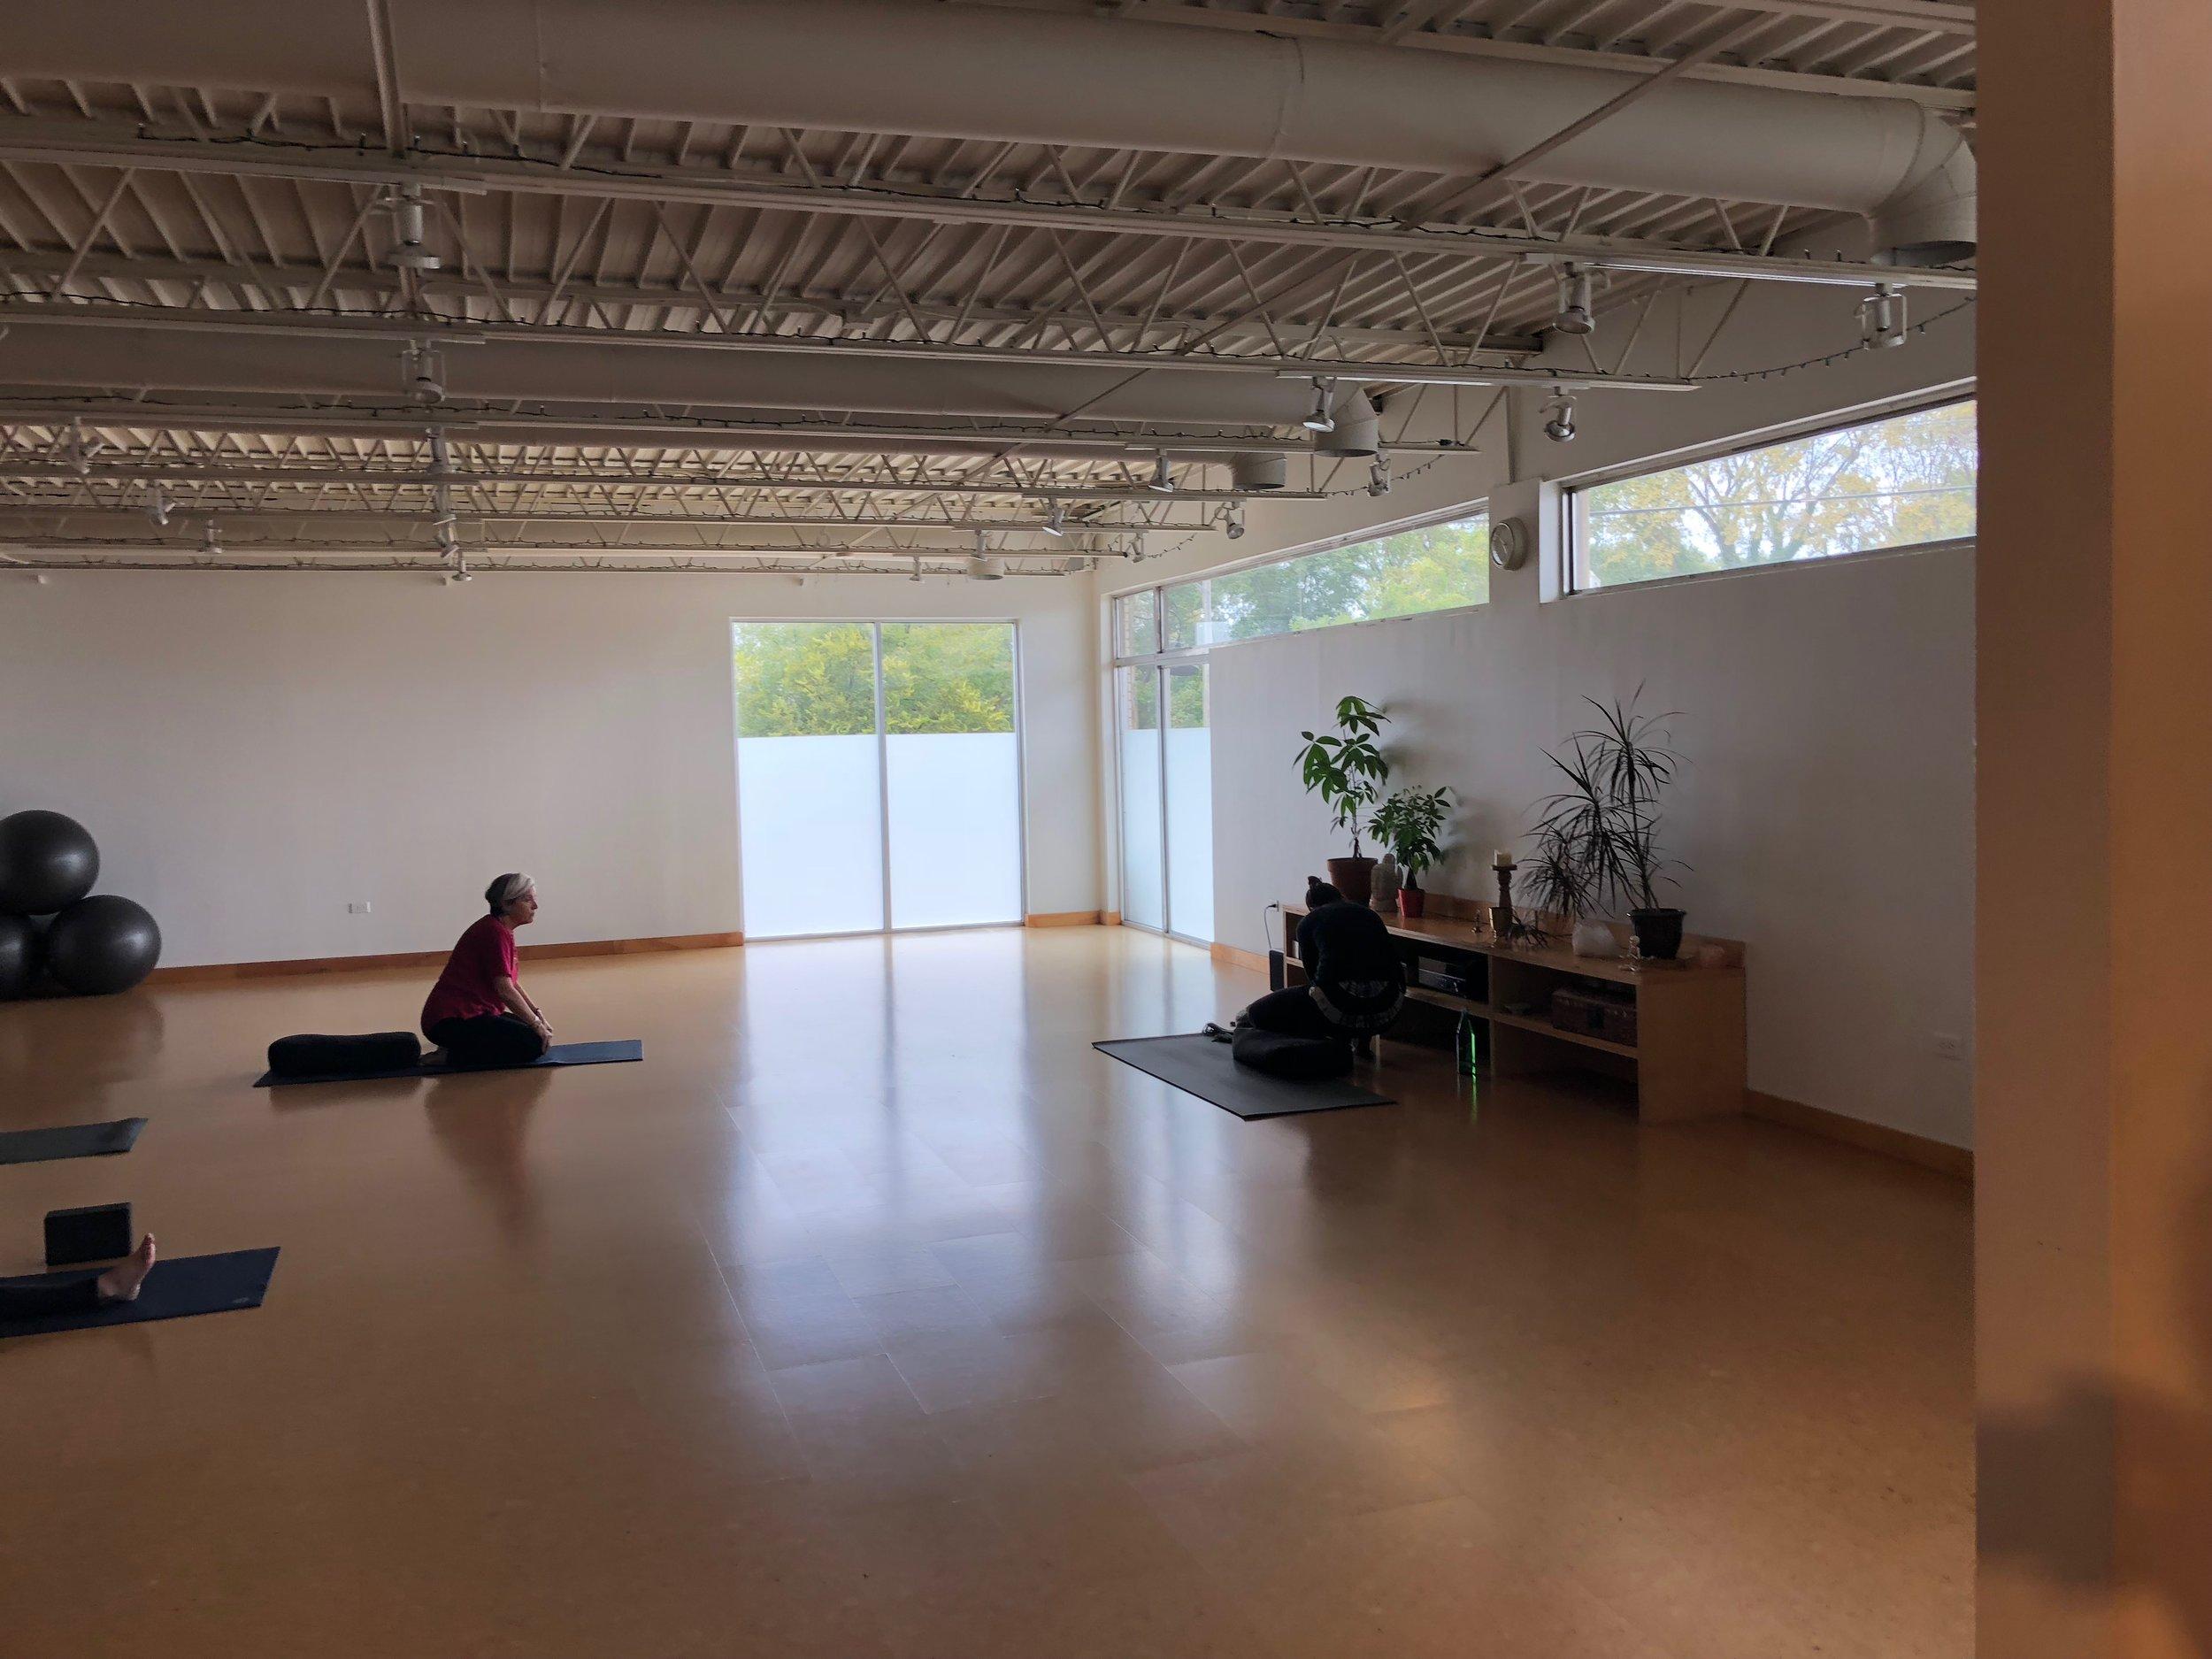 Studio space at Arkansas Yoga Collective